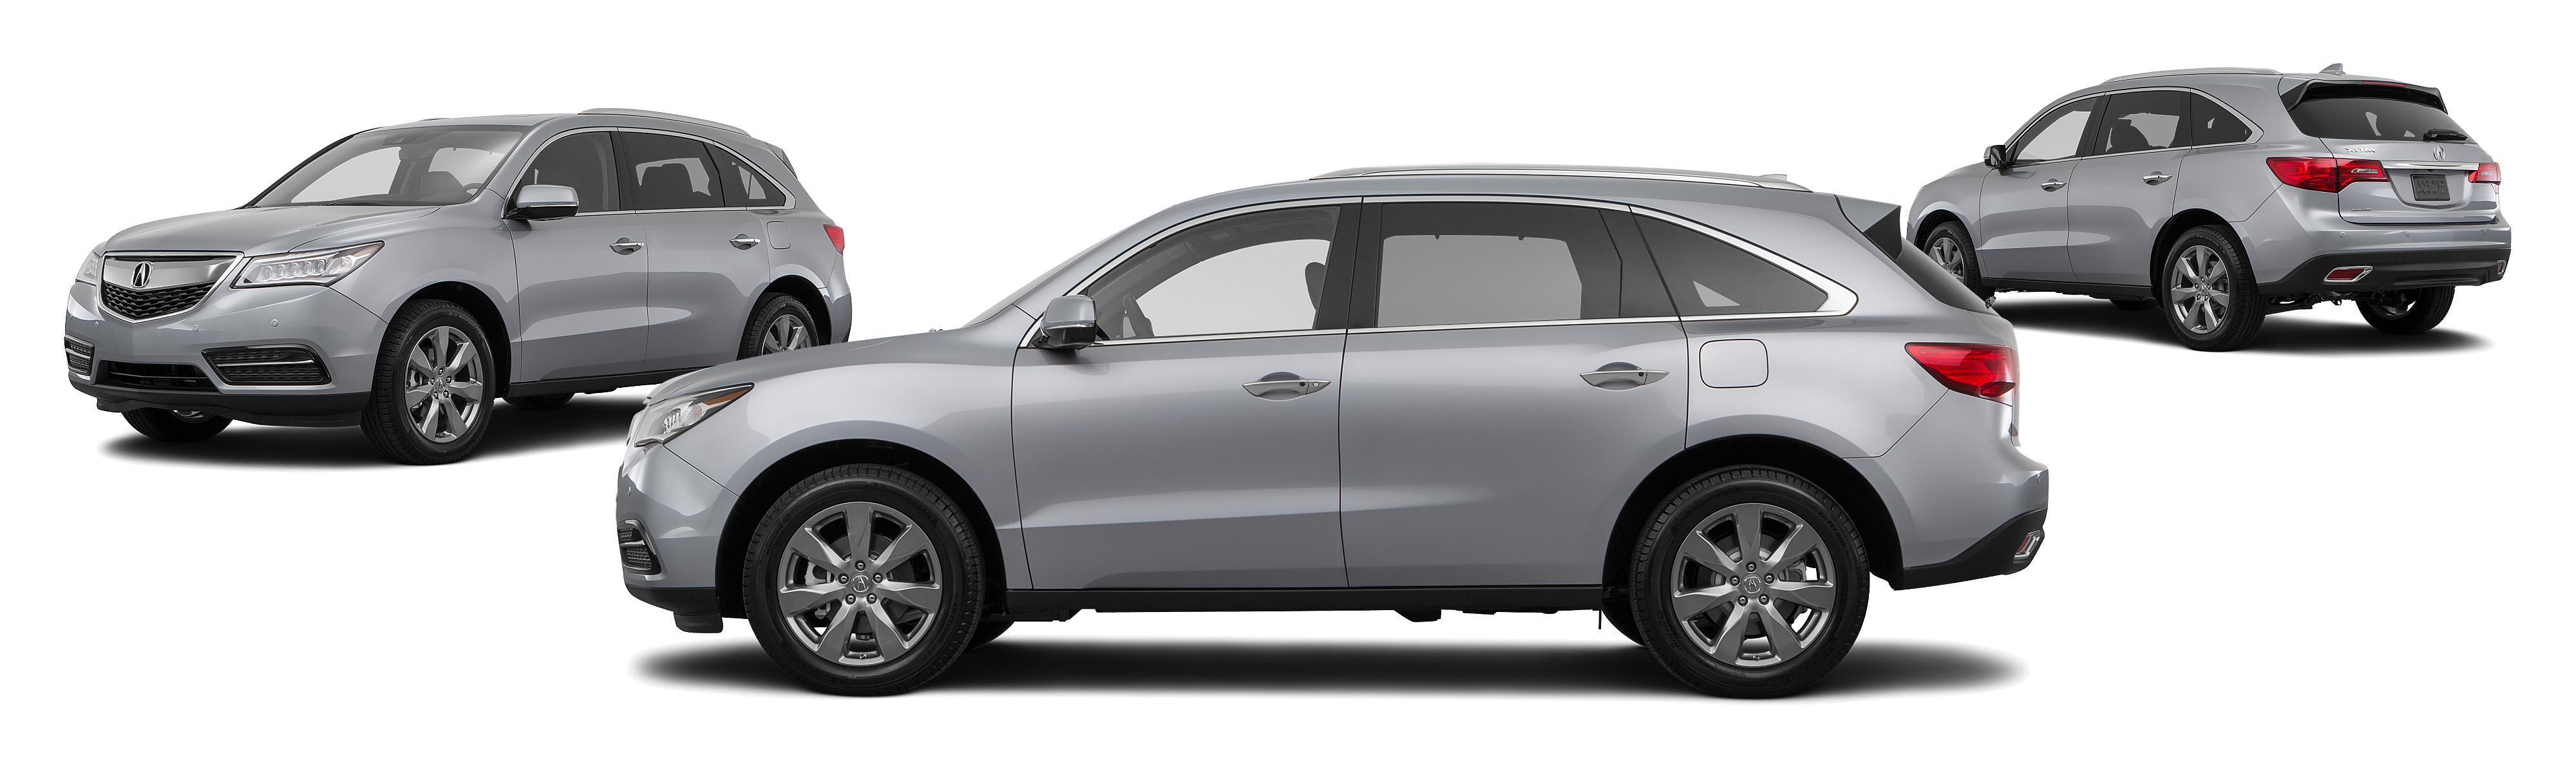 deals inventory specials napleton il new acura elmhurst lease htm mdx view ed car